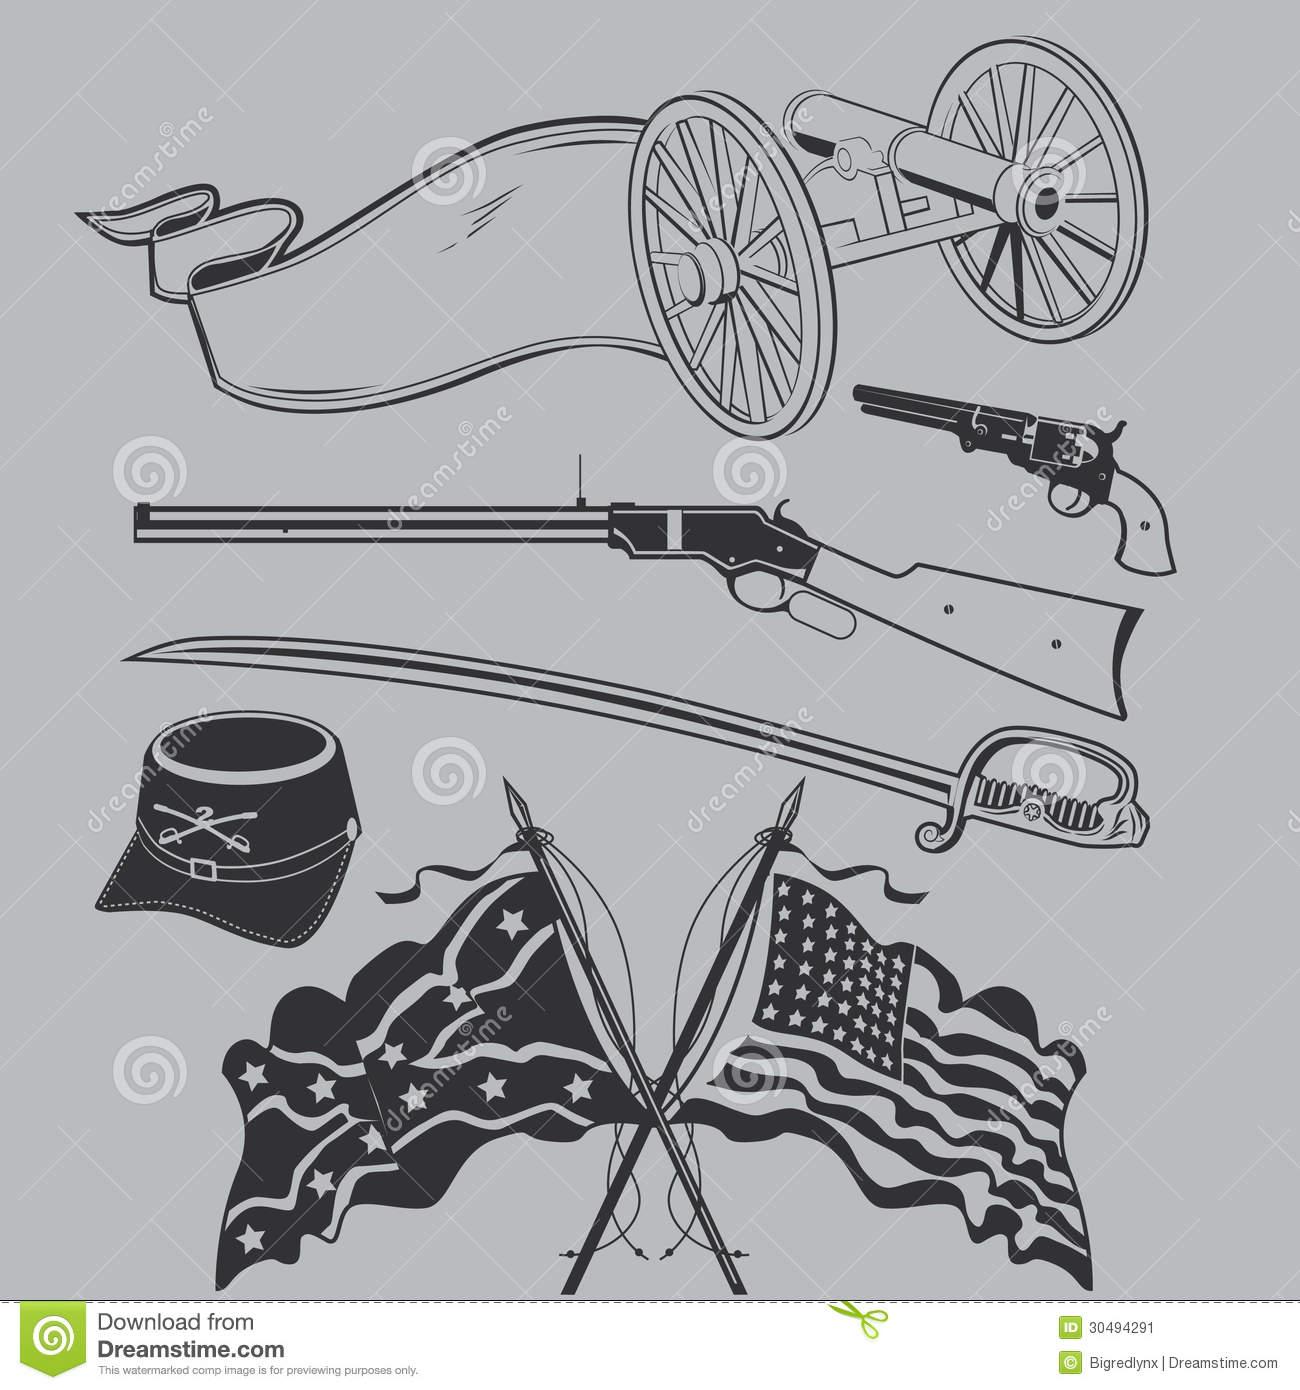 Civil War Clip Art Collection Stock Vector.